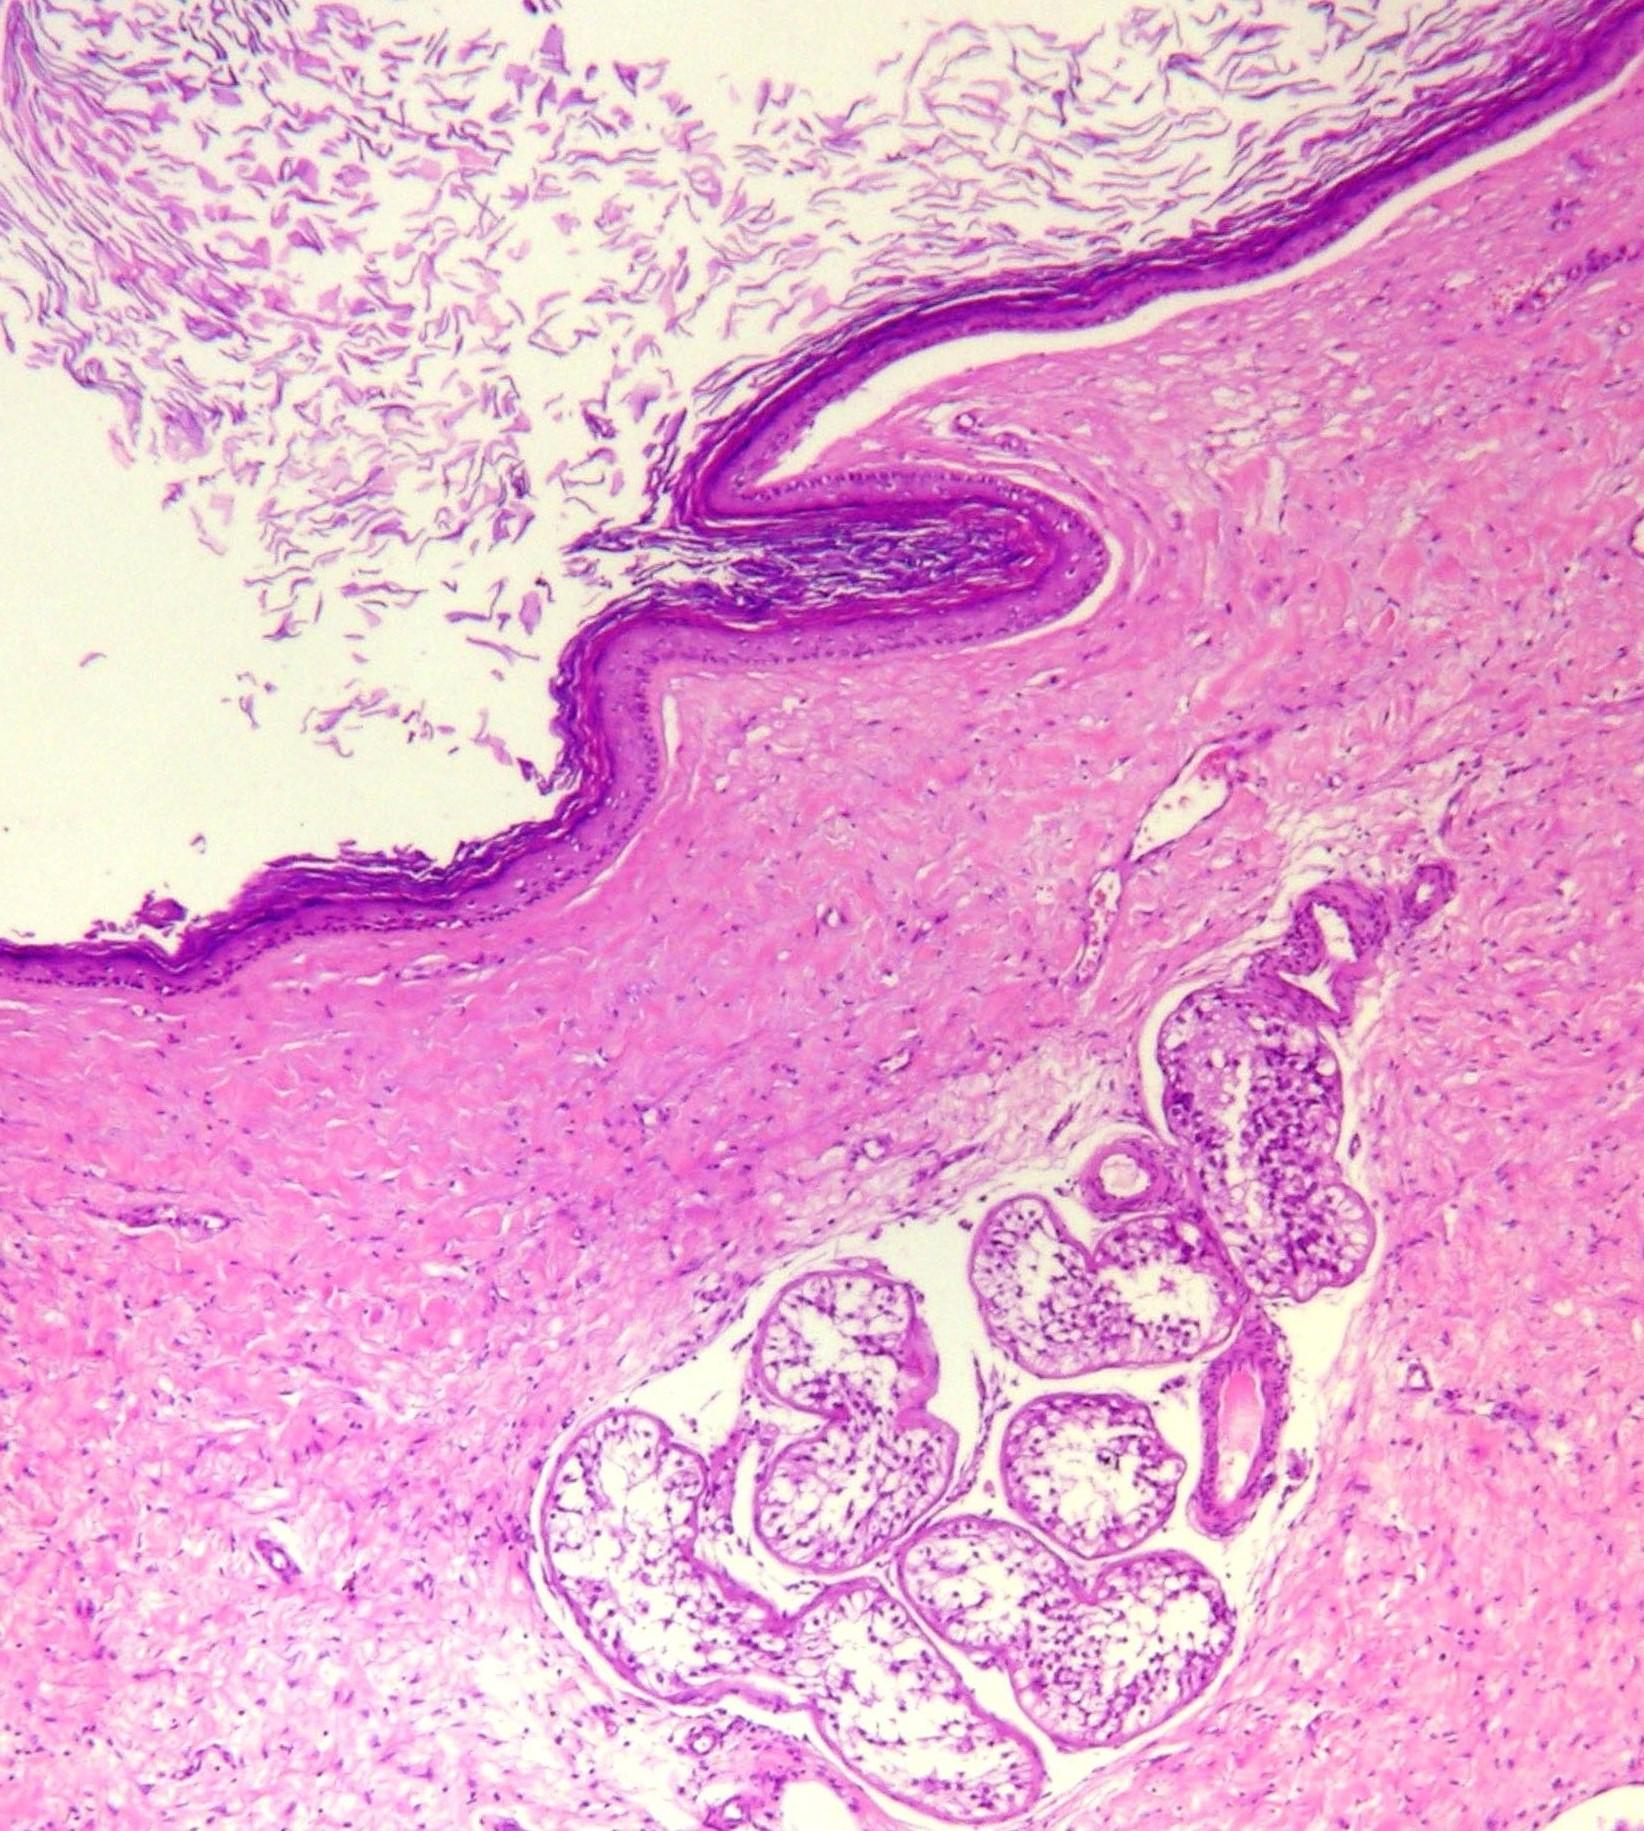 Caso Epidermal Cyst Icd 10